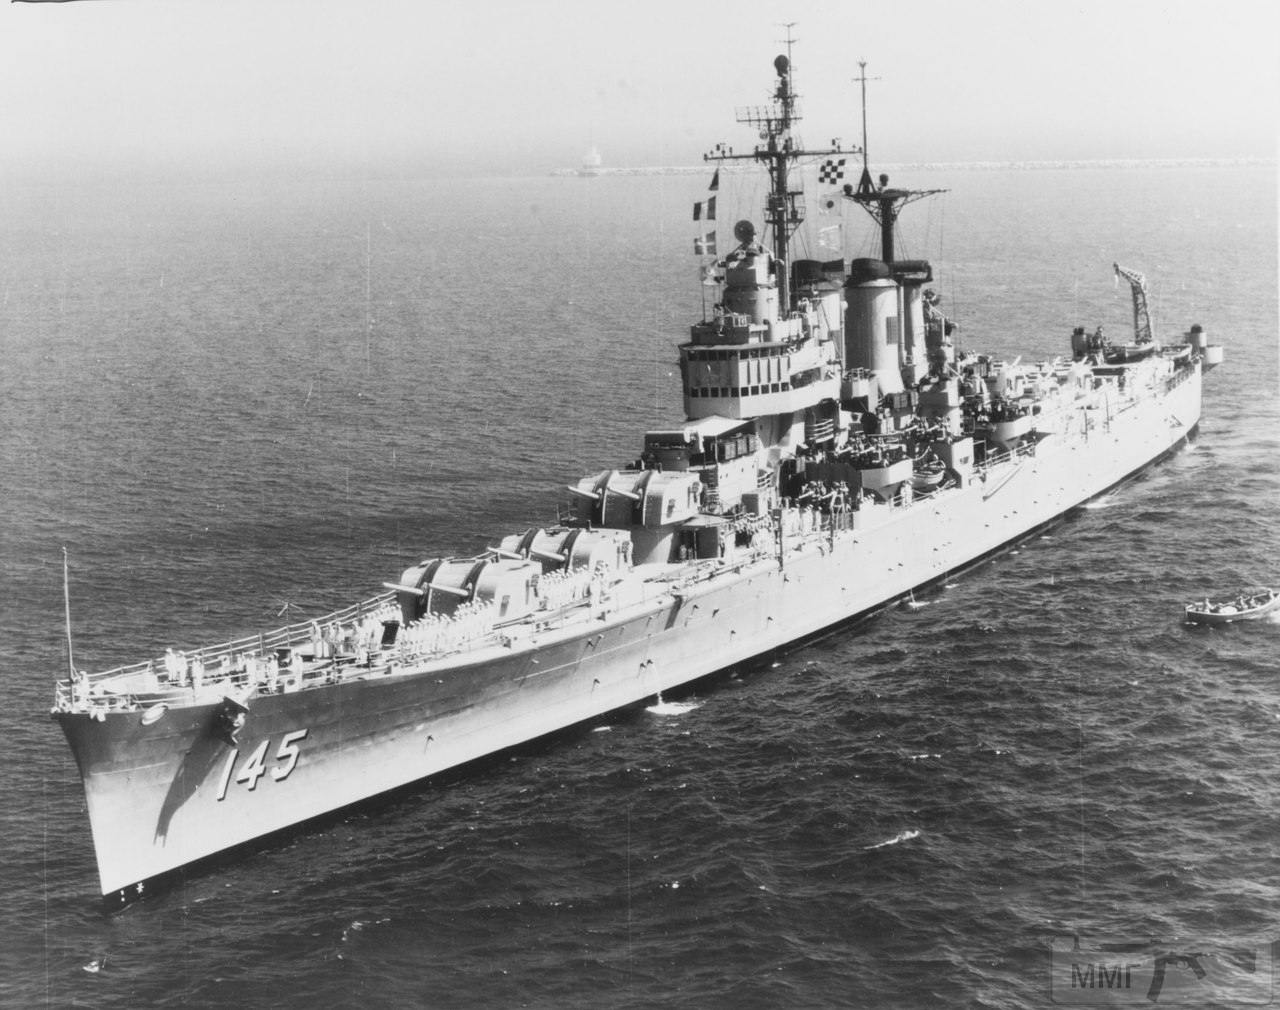 16890 - US NAVY